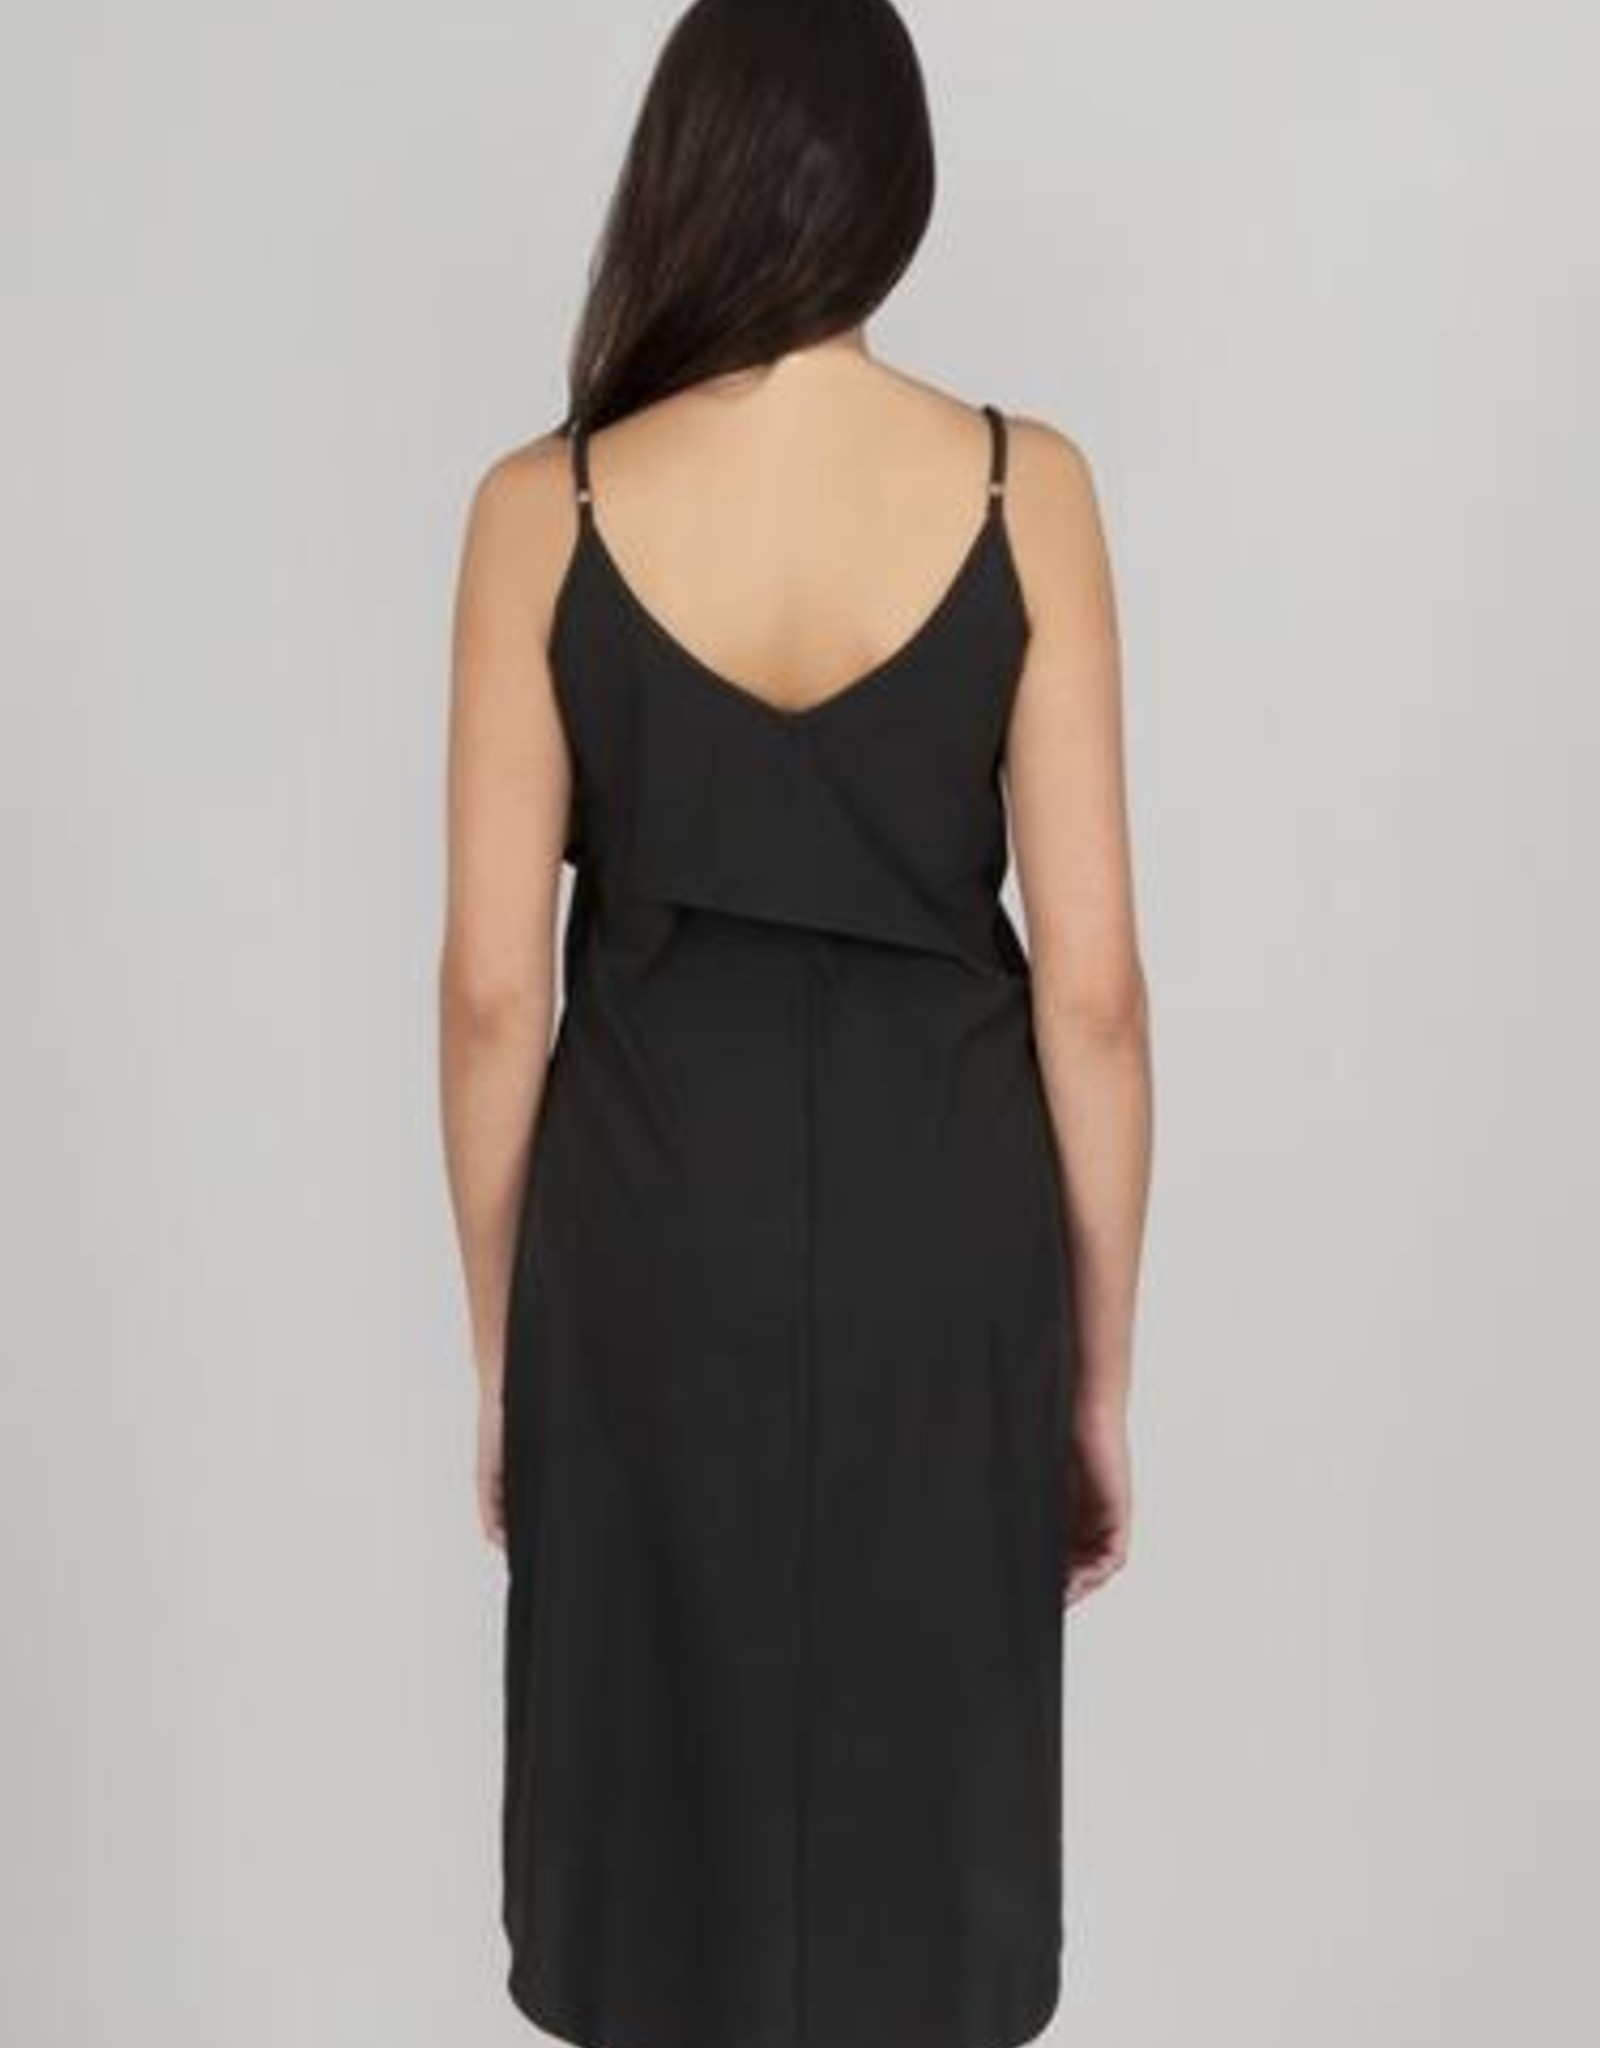 Indygena is now Indyeva Aerel dress